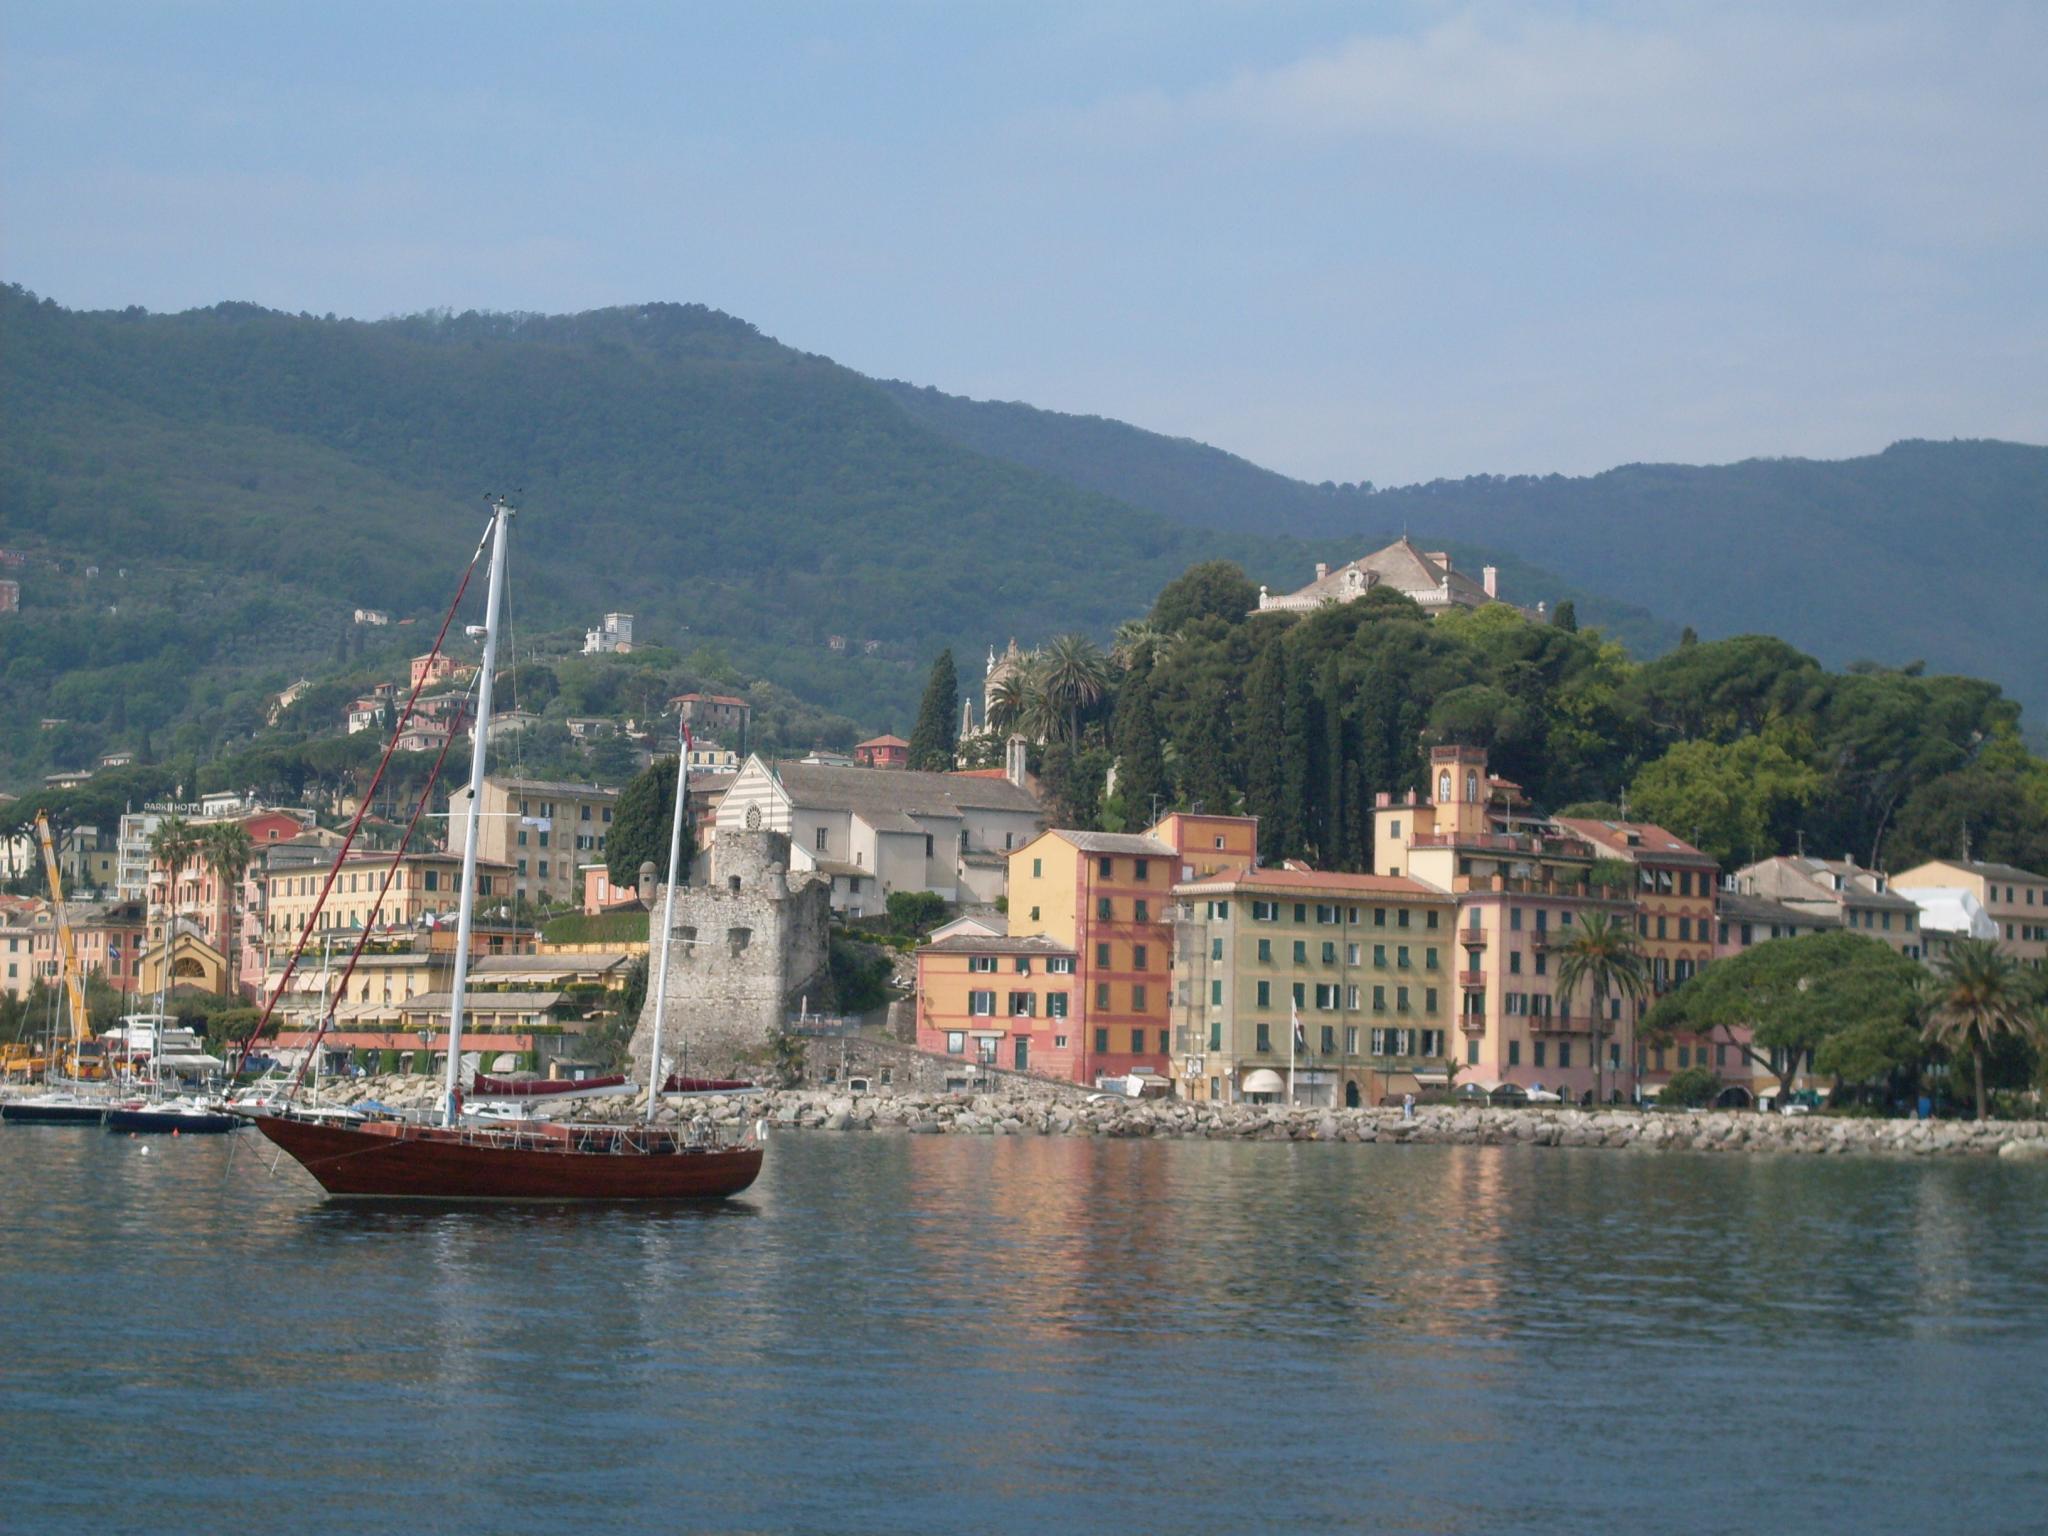 lungomare di Santa Margherita Ligure